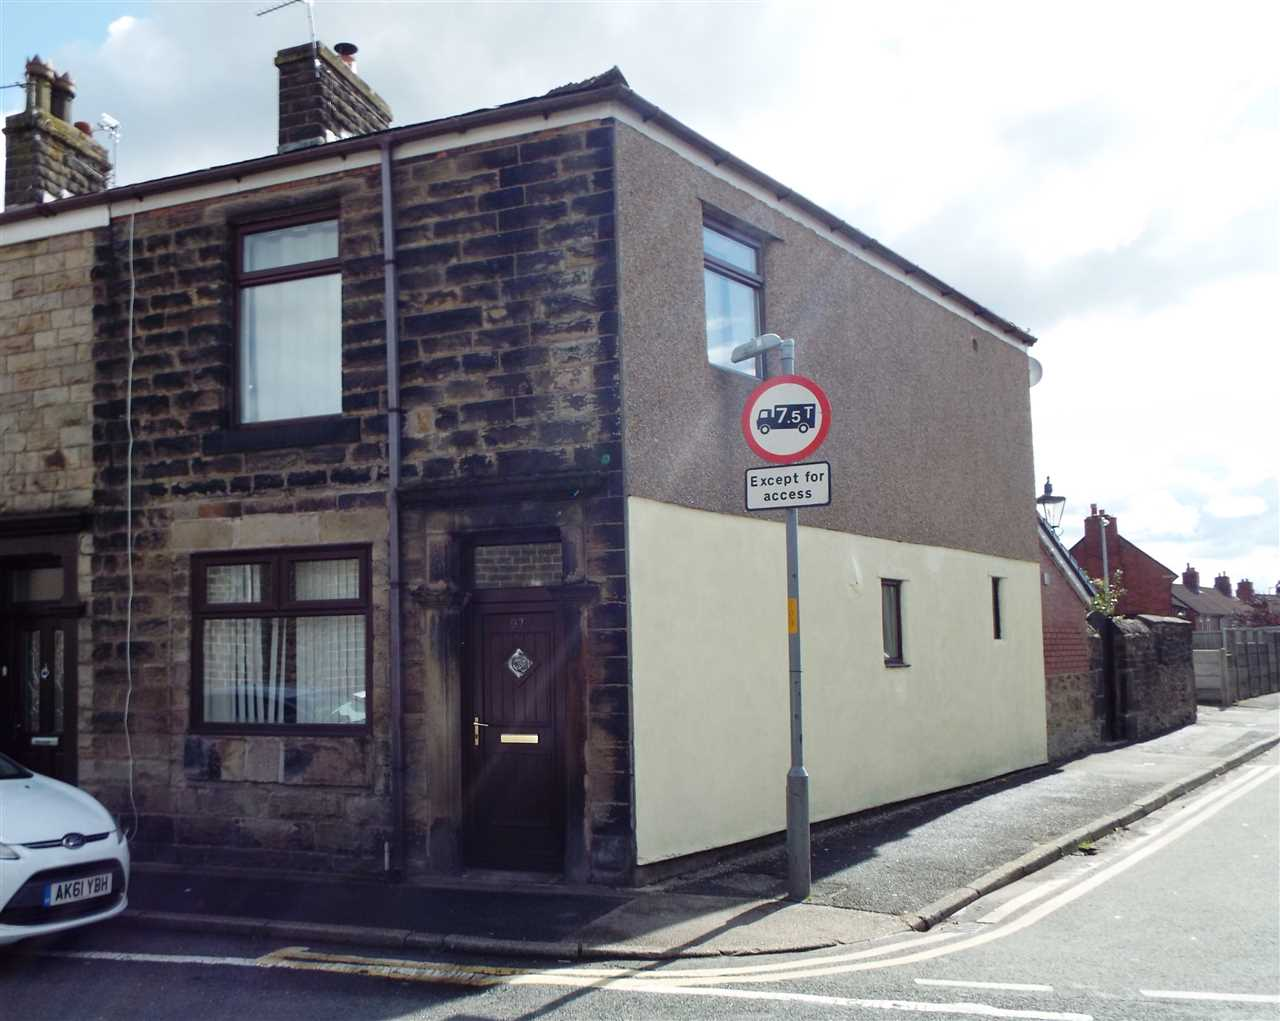 3 bed end-of-terrace for sale in Park Road, Adlington, Adlington 1